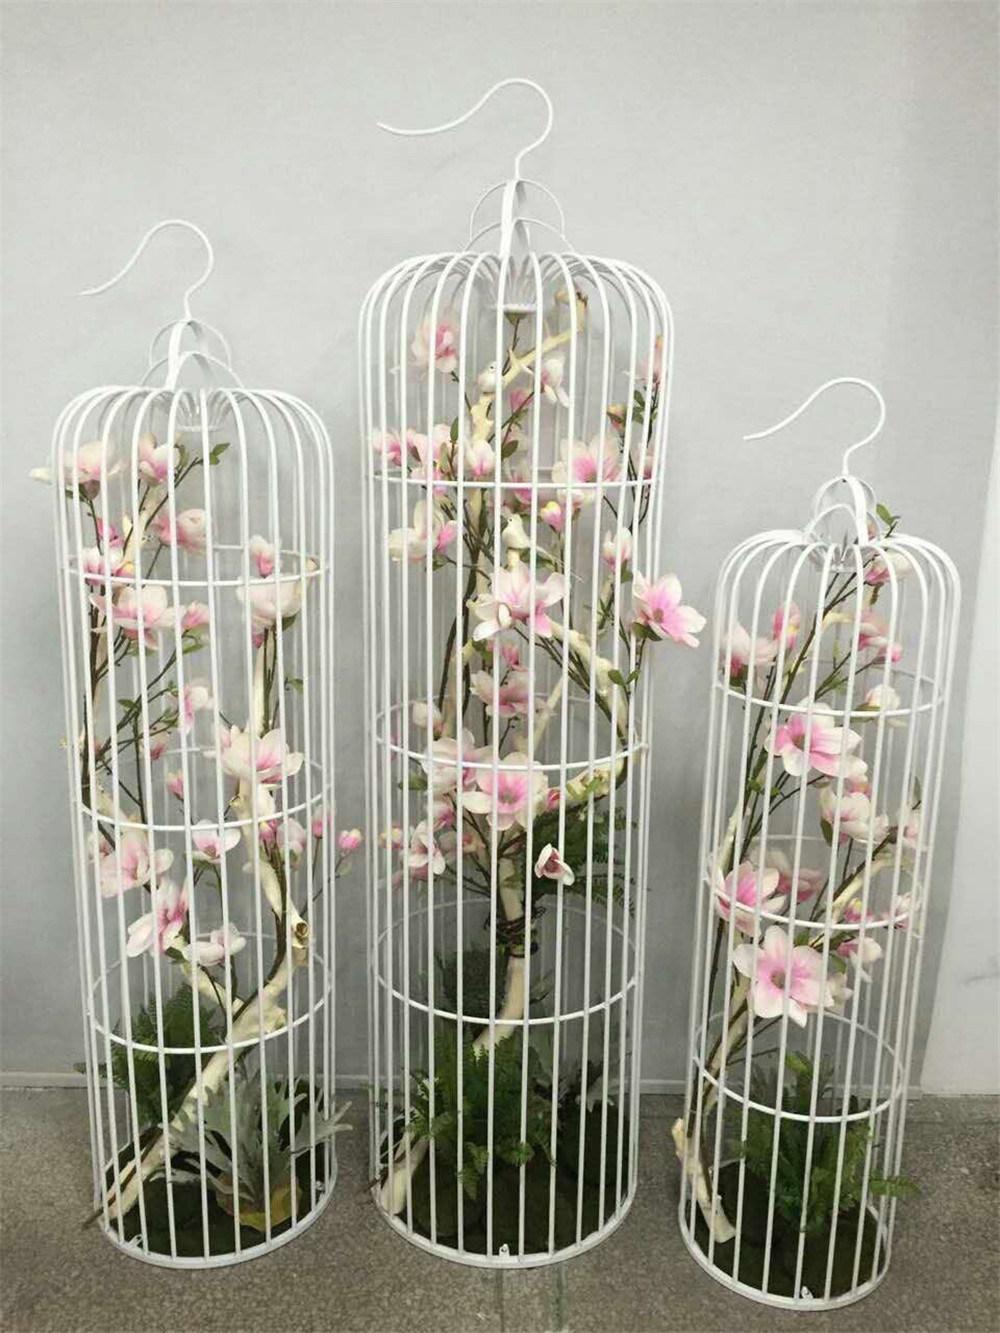 China Custom Metal Crafts Decorative Bird Cage For Wedding China Wedding Decoration And Garden Decoration Price